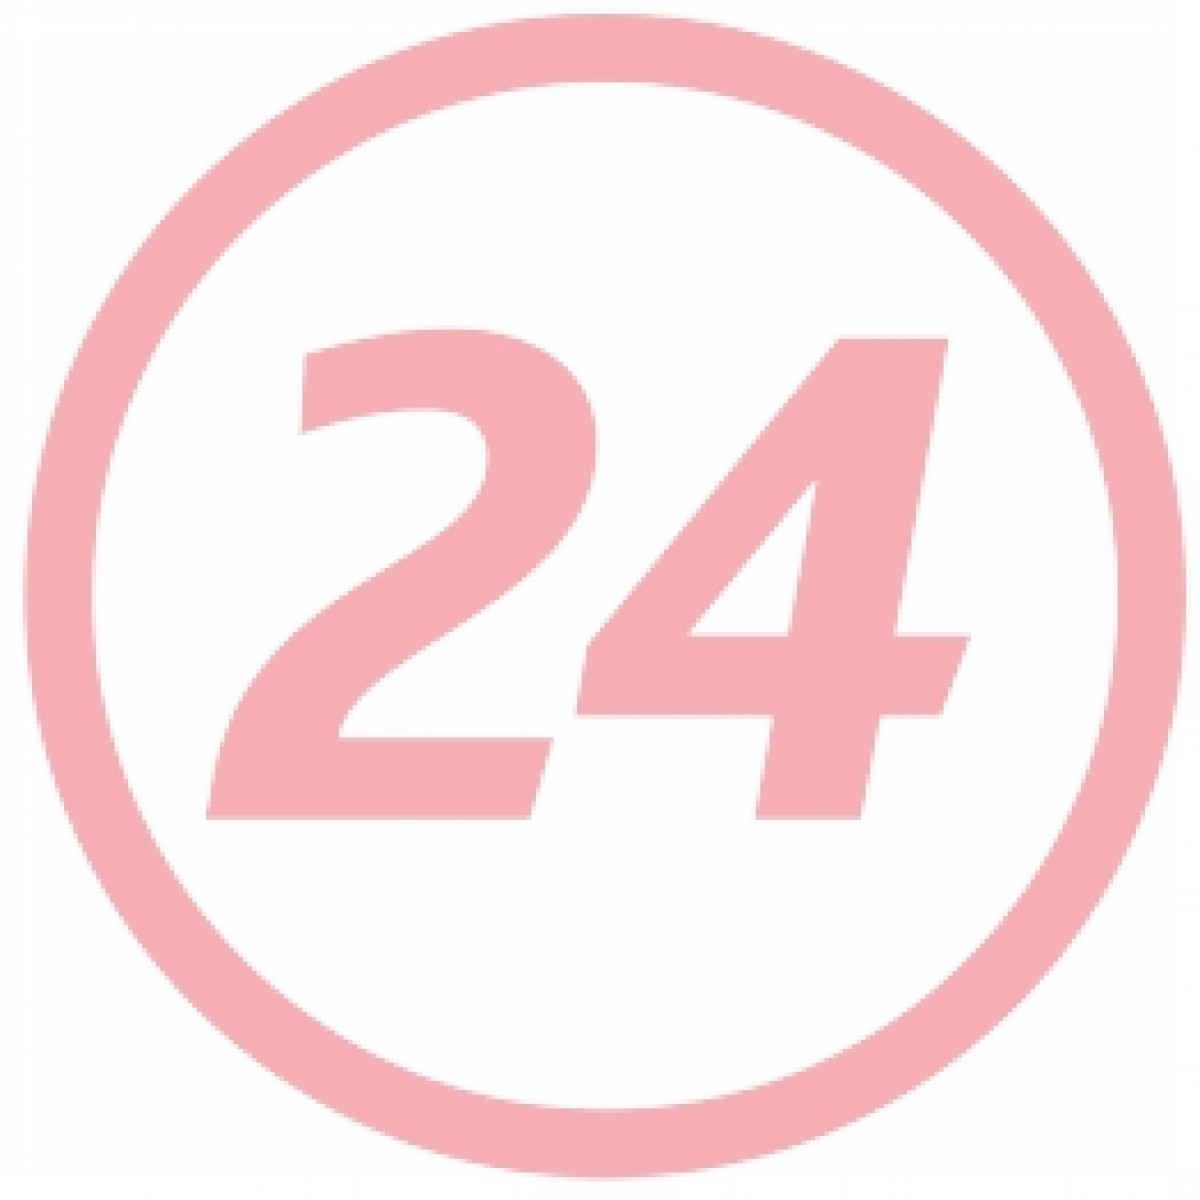 Tommee Tippee Kit Diversificare Hrana 4+ Luni Pentru Fete, Kit, 1buc